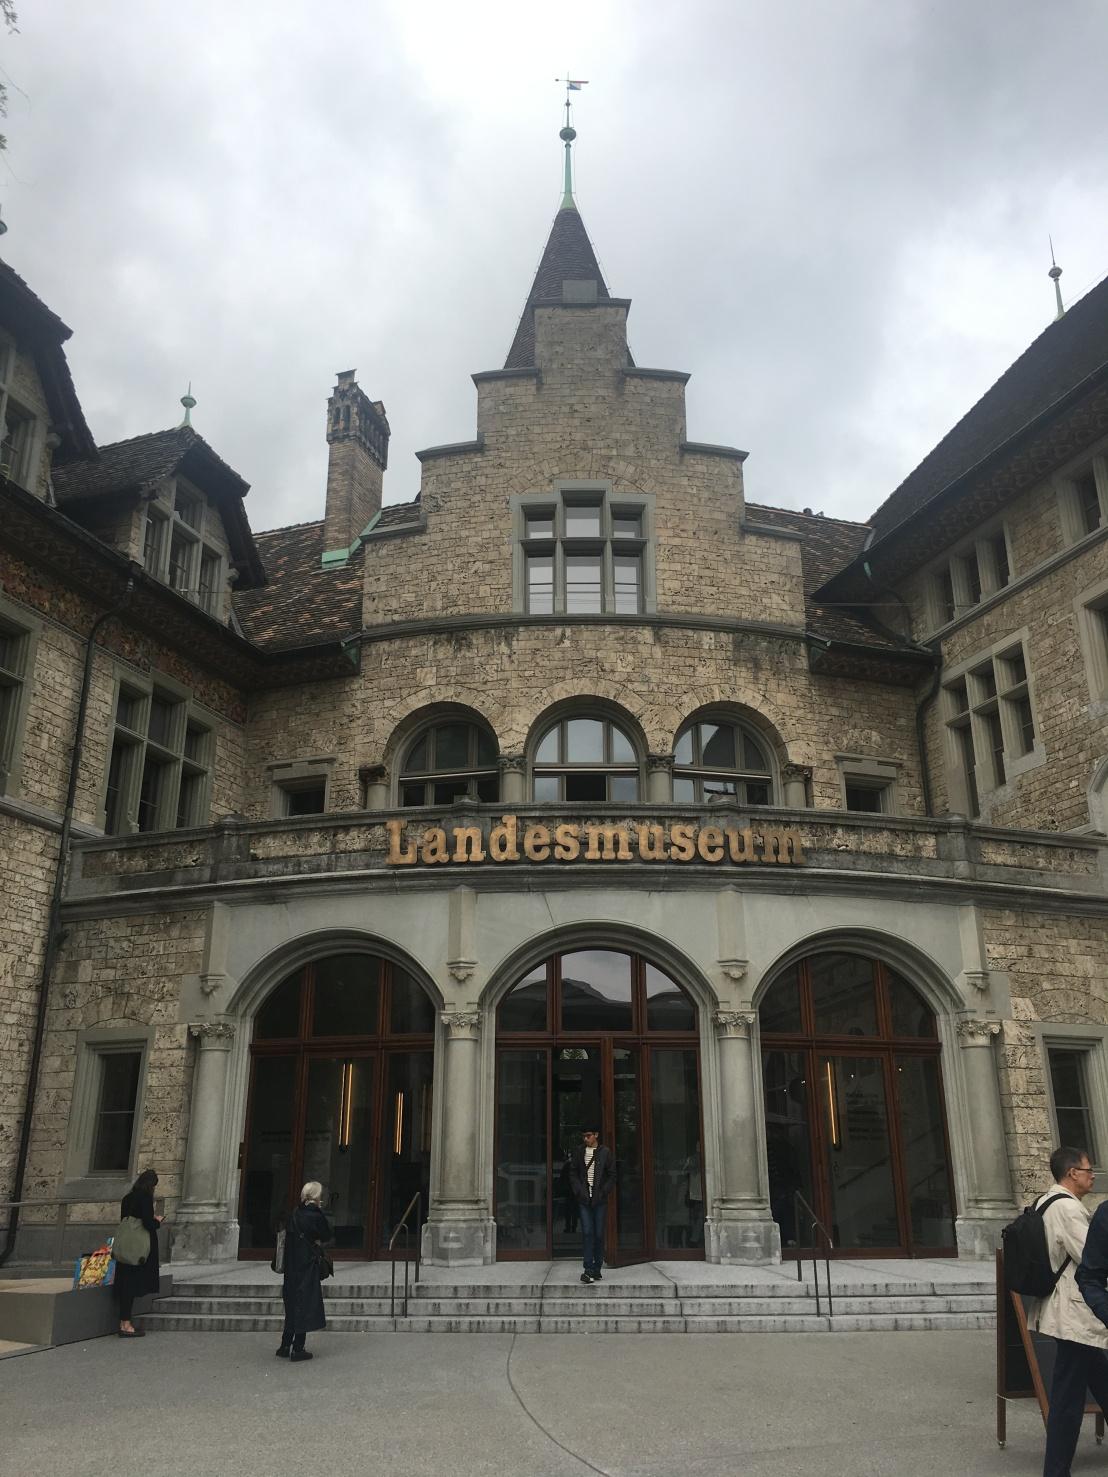 Landesmuseum 1